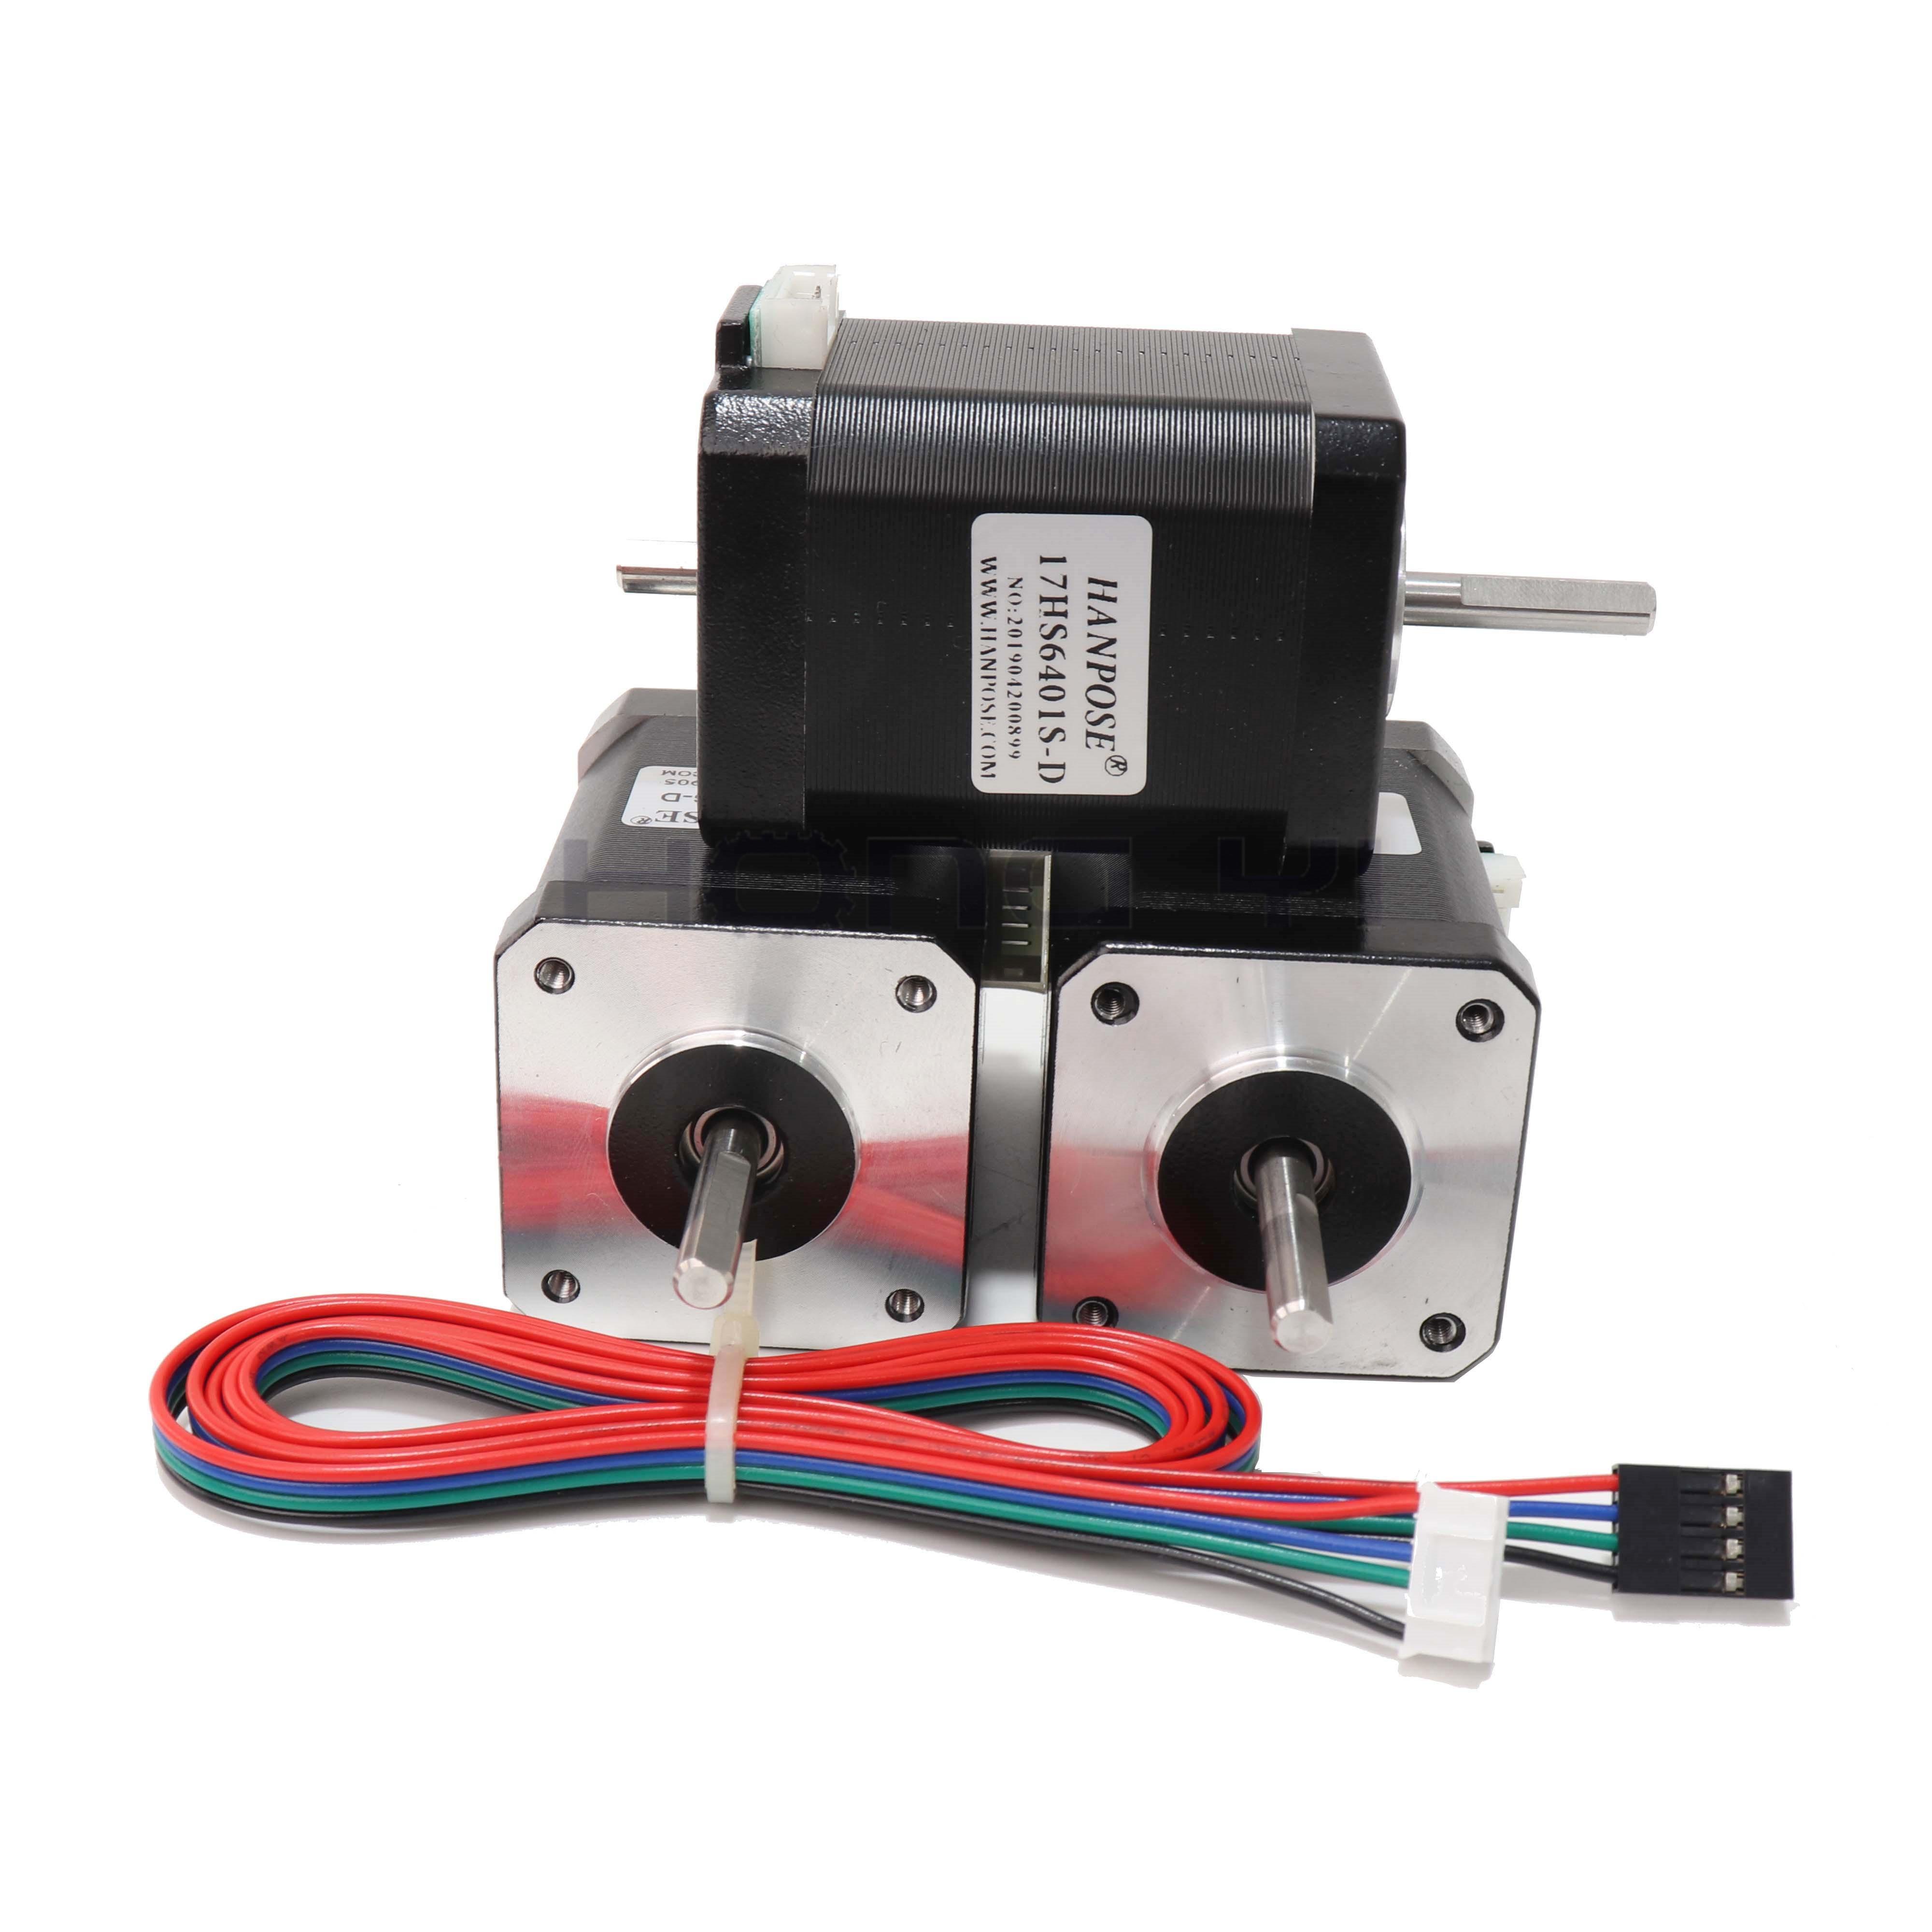 Image 4 - Free shipping hybrid stepper motor nema 17 motor 60mm (1.7A, 0.73NM, 60mm, 4 wire) 17HS6401S for 3D printer cncStepper Motor   -